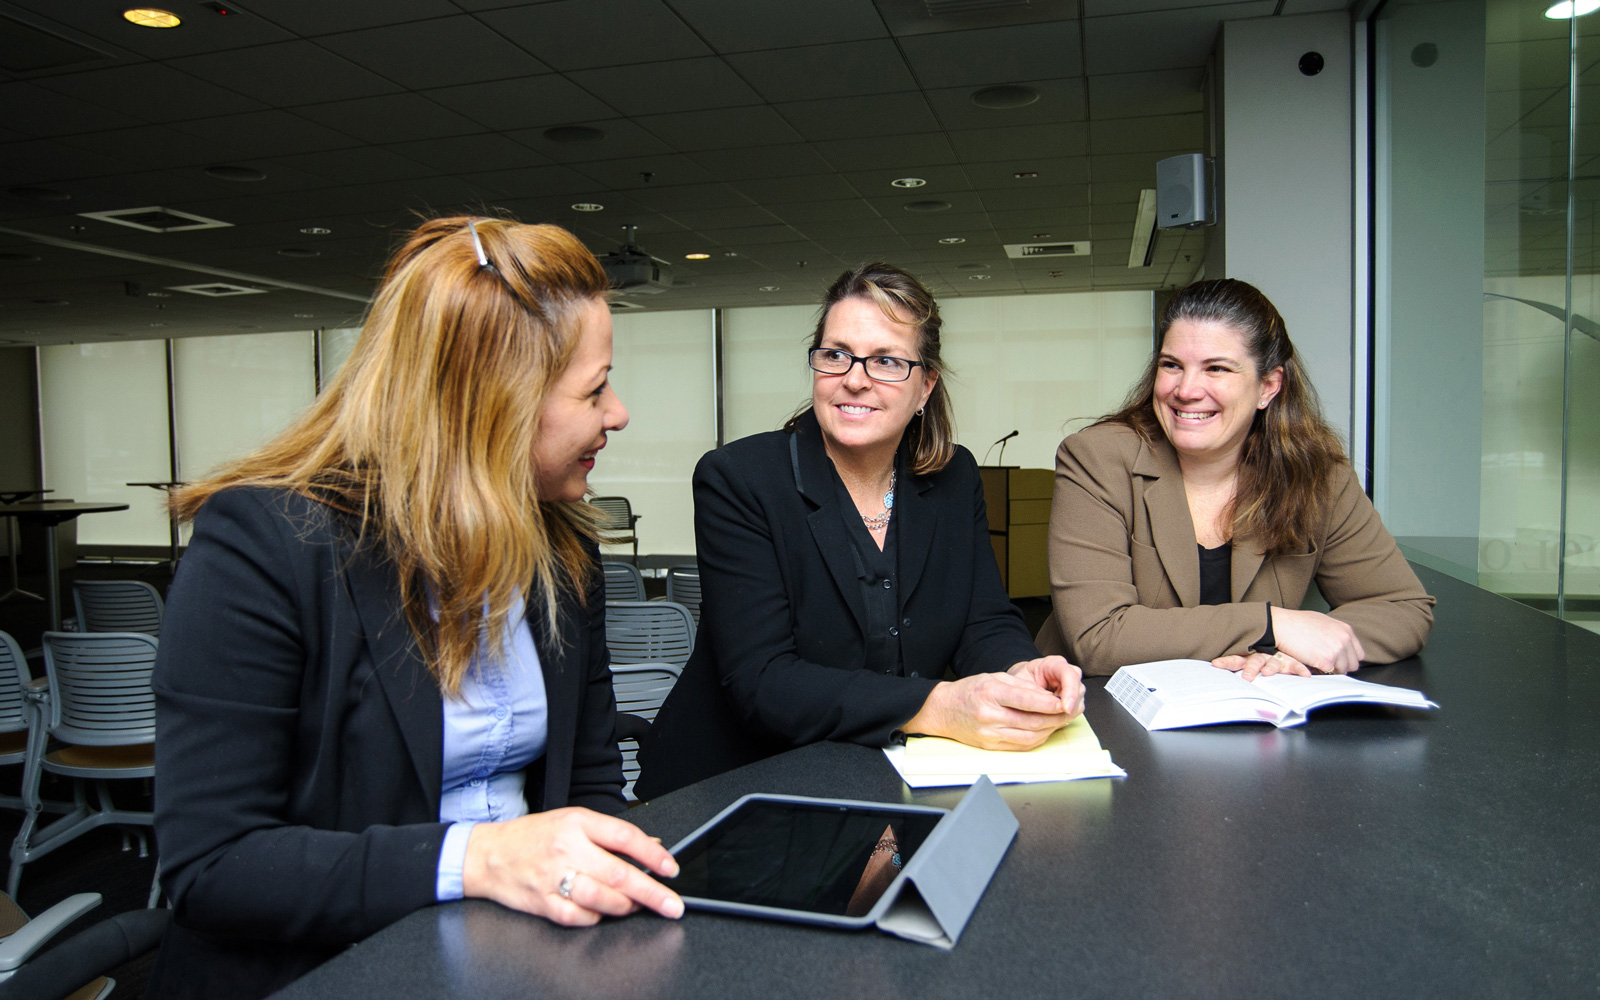 Graduate Programs in Human Resource Management